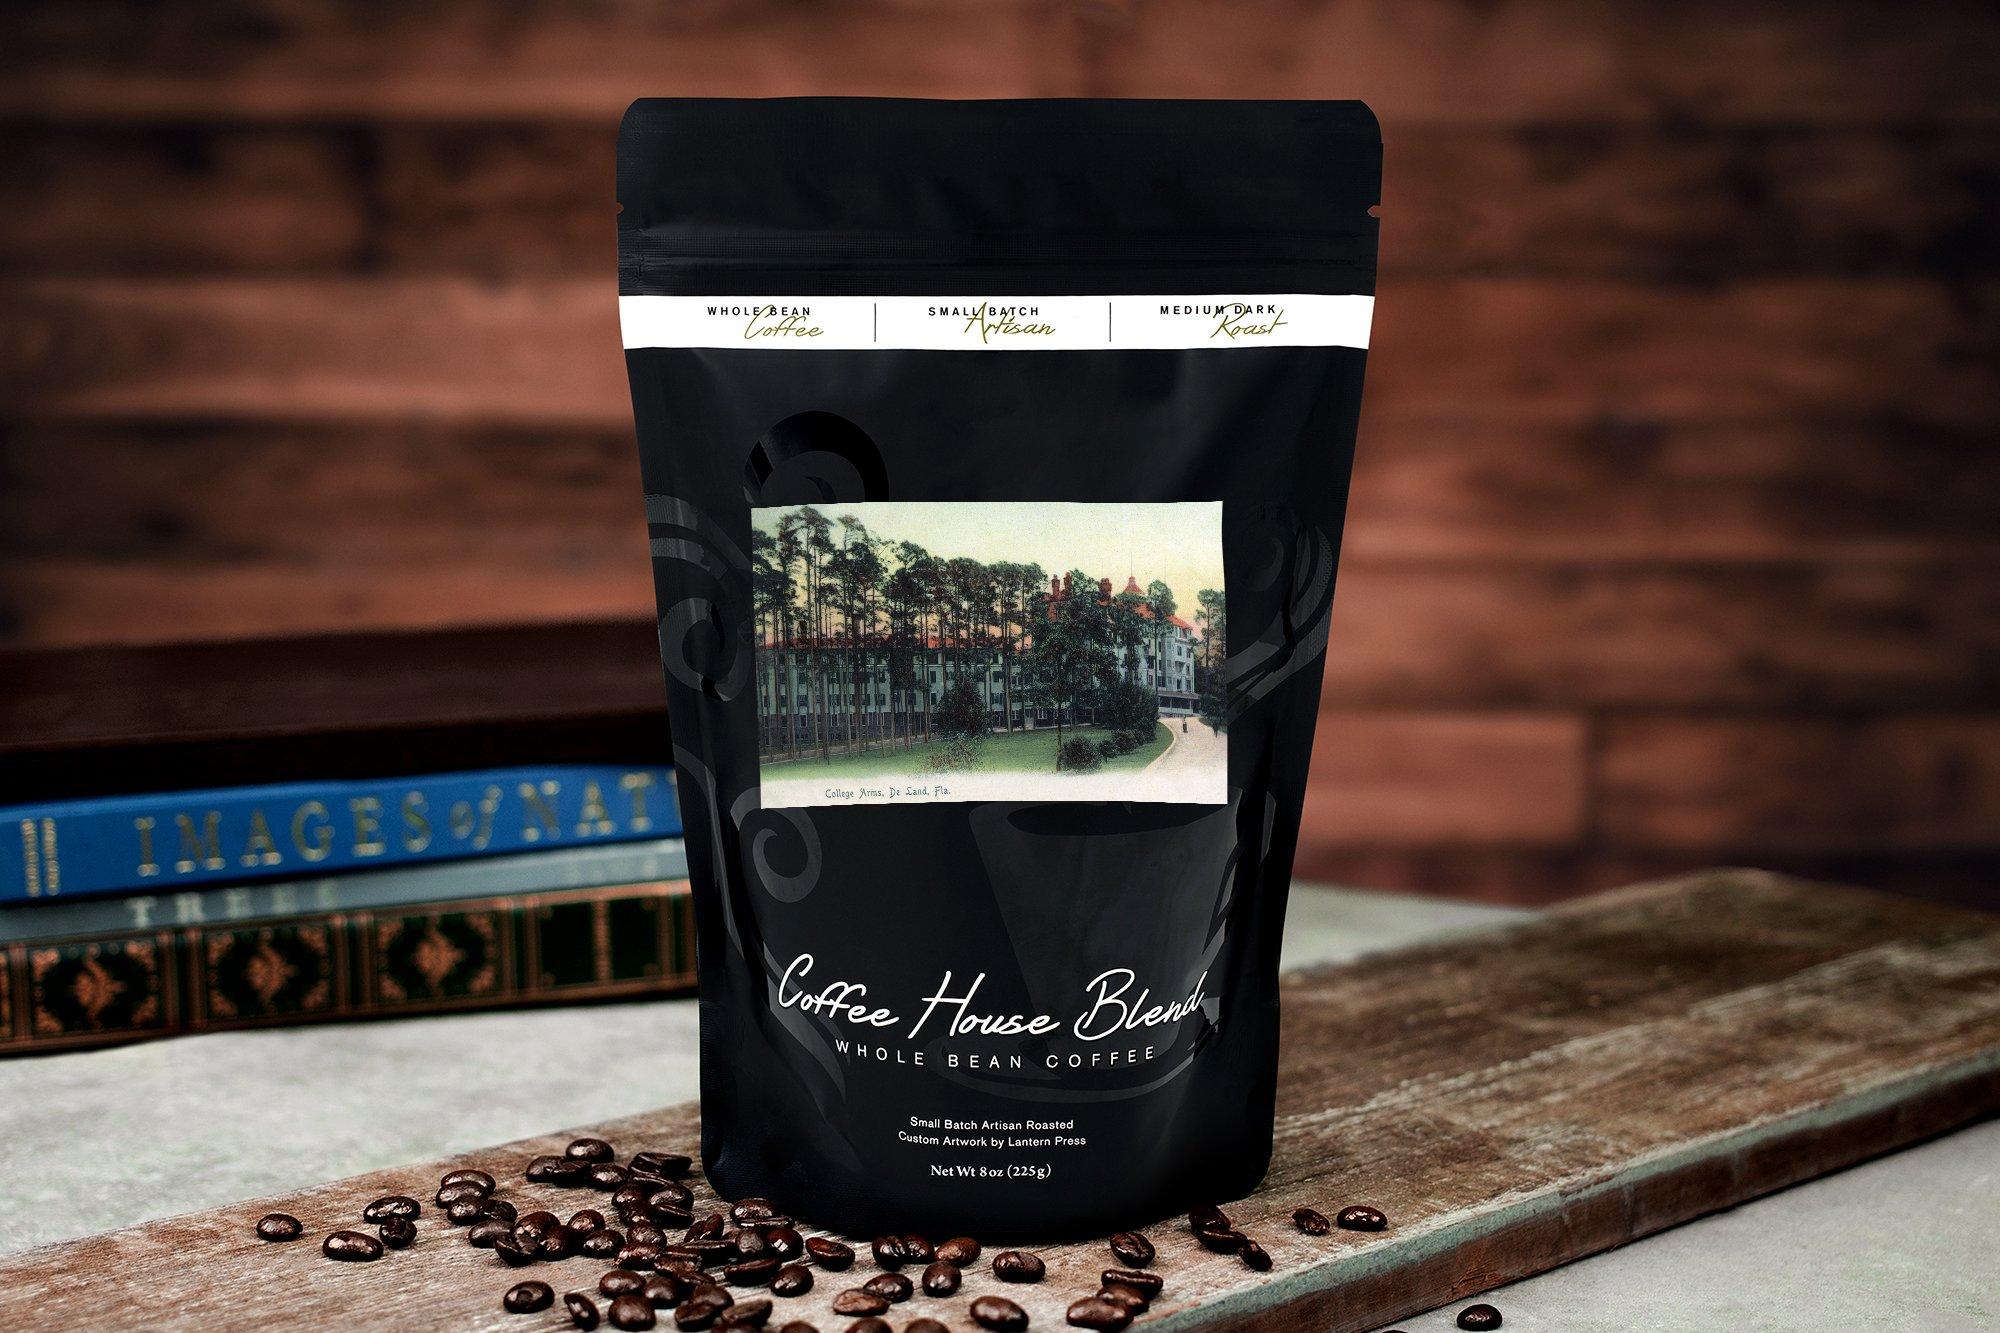 Deland, Florida - College Arms Exterior View (8oz Whole Bean Small Batch Artisan Coffee - Bold & Strong Medium Dark Roast w/Artwork) by Lantern Press (Image #2)